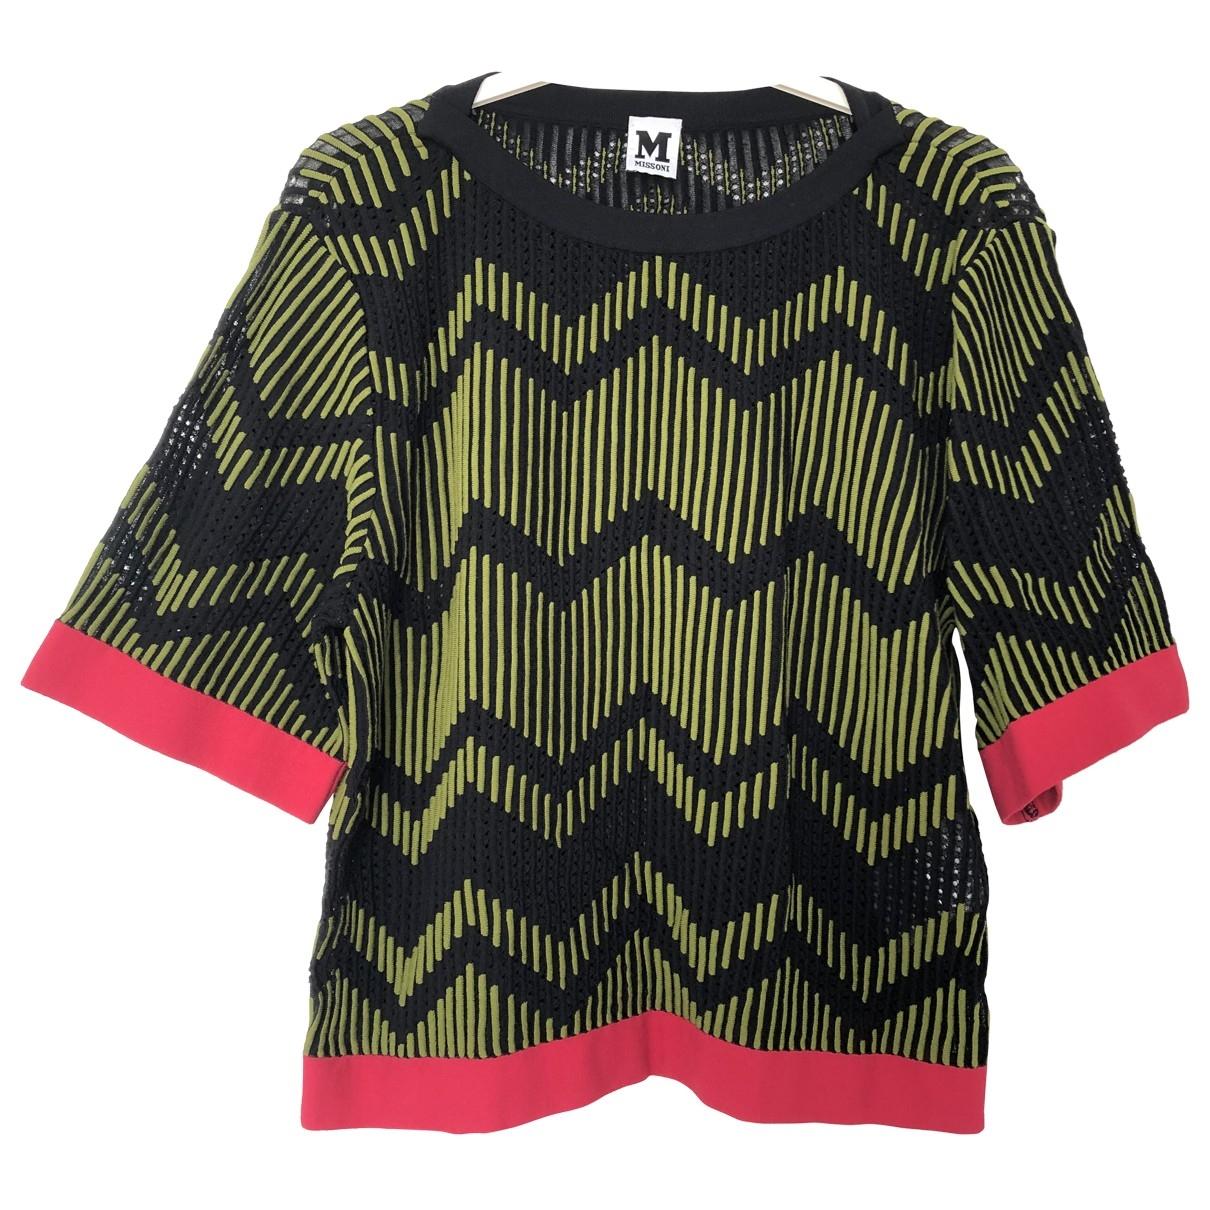 M Missoni \N Green Cotton  top for Women M